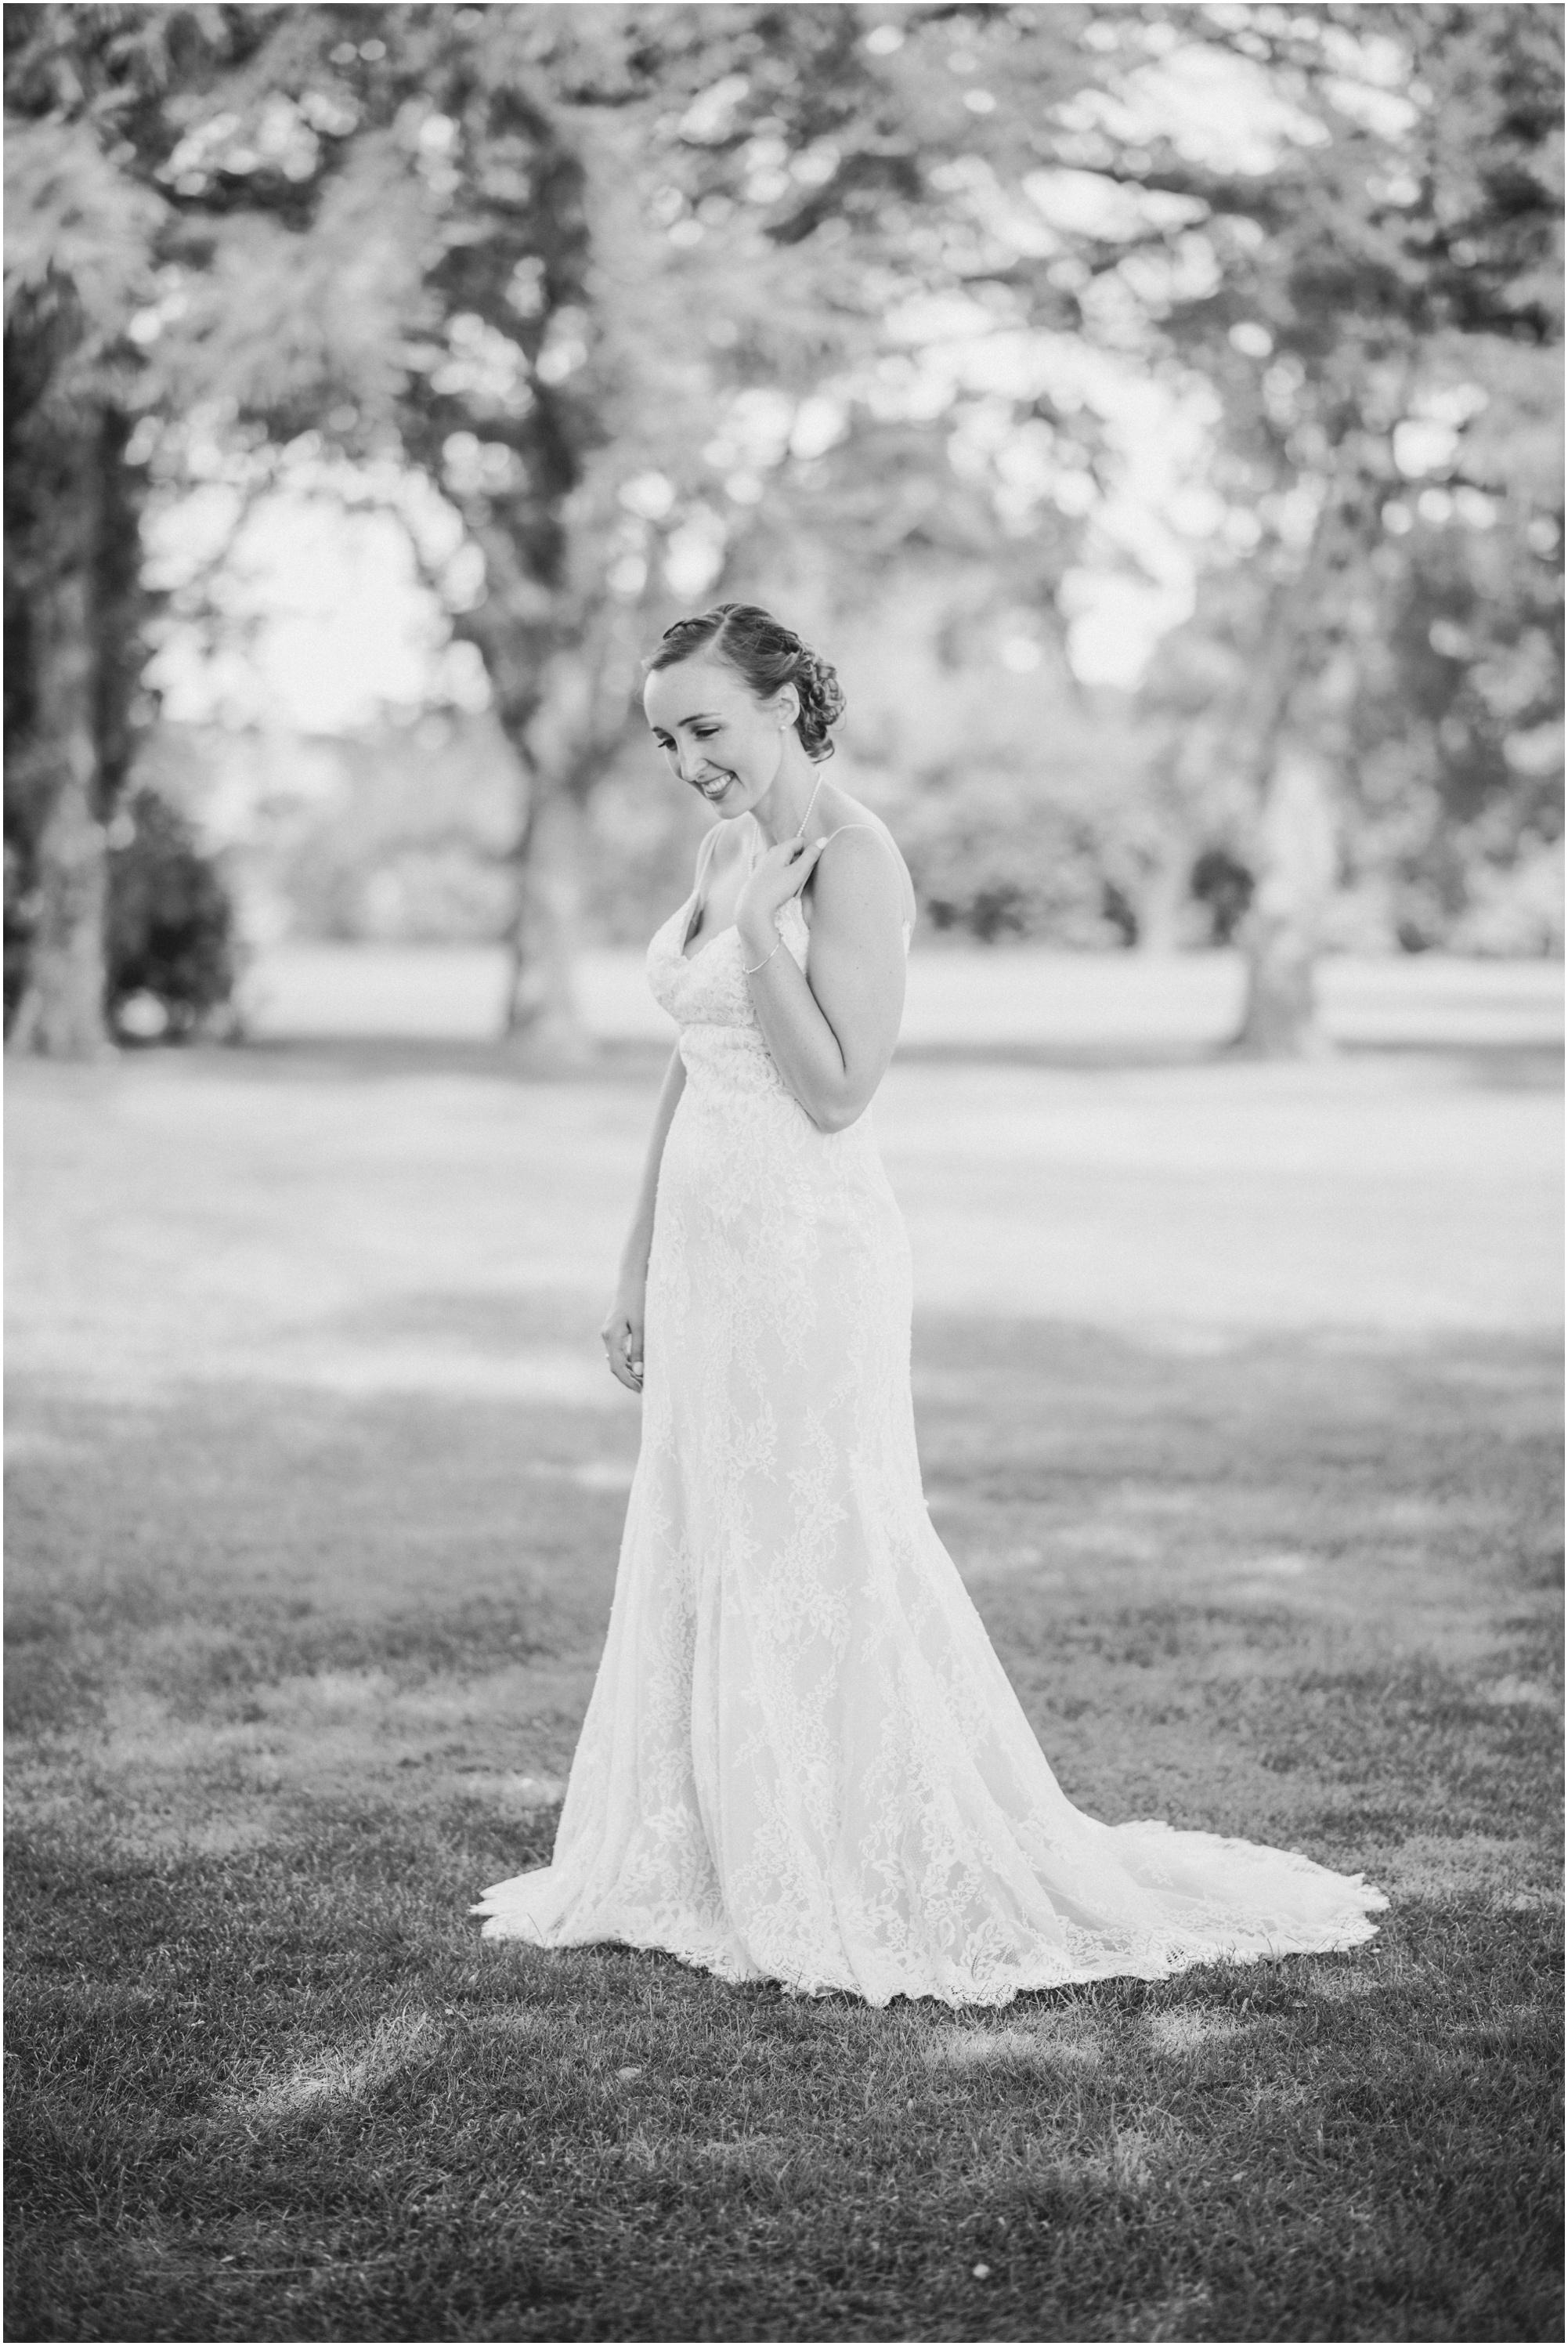 Wisconsin-Wedding-Photographer-Reedsburg-Country-Club-Kaela-and Matt-Wedding-90.jpg